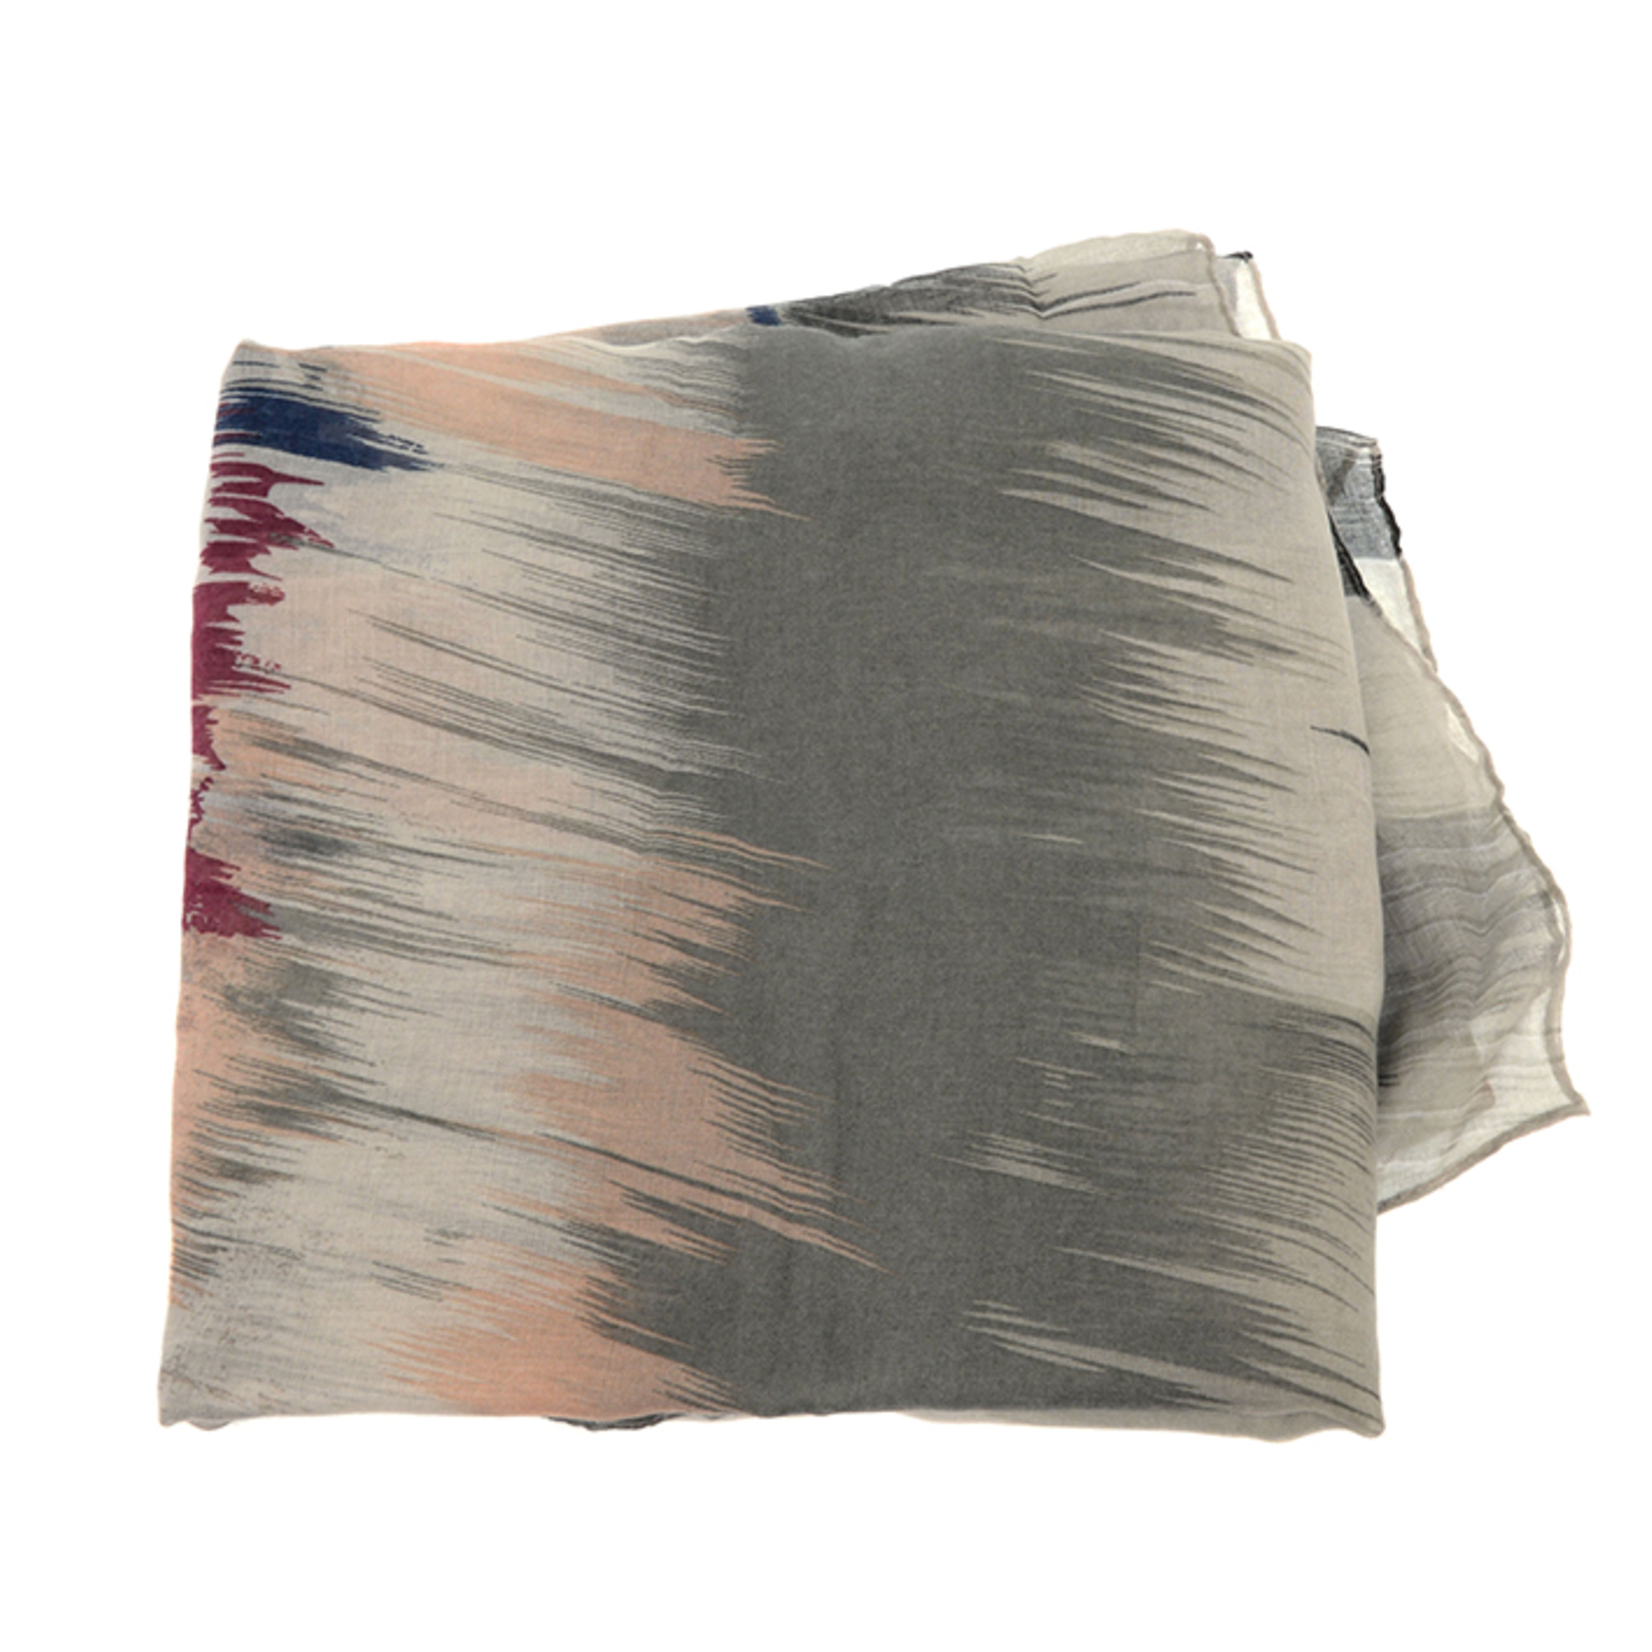 Joy Susan Joy Susan 90x180 Neutral Blurred Ikat Scarf